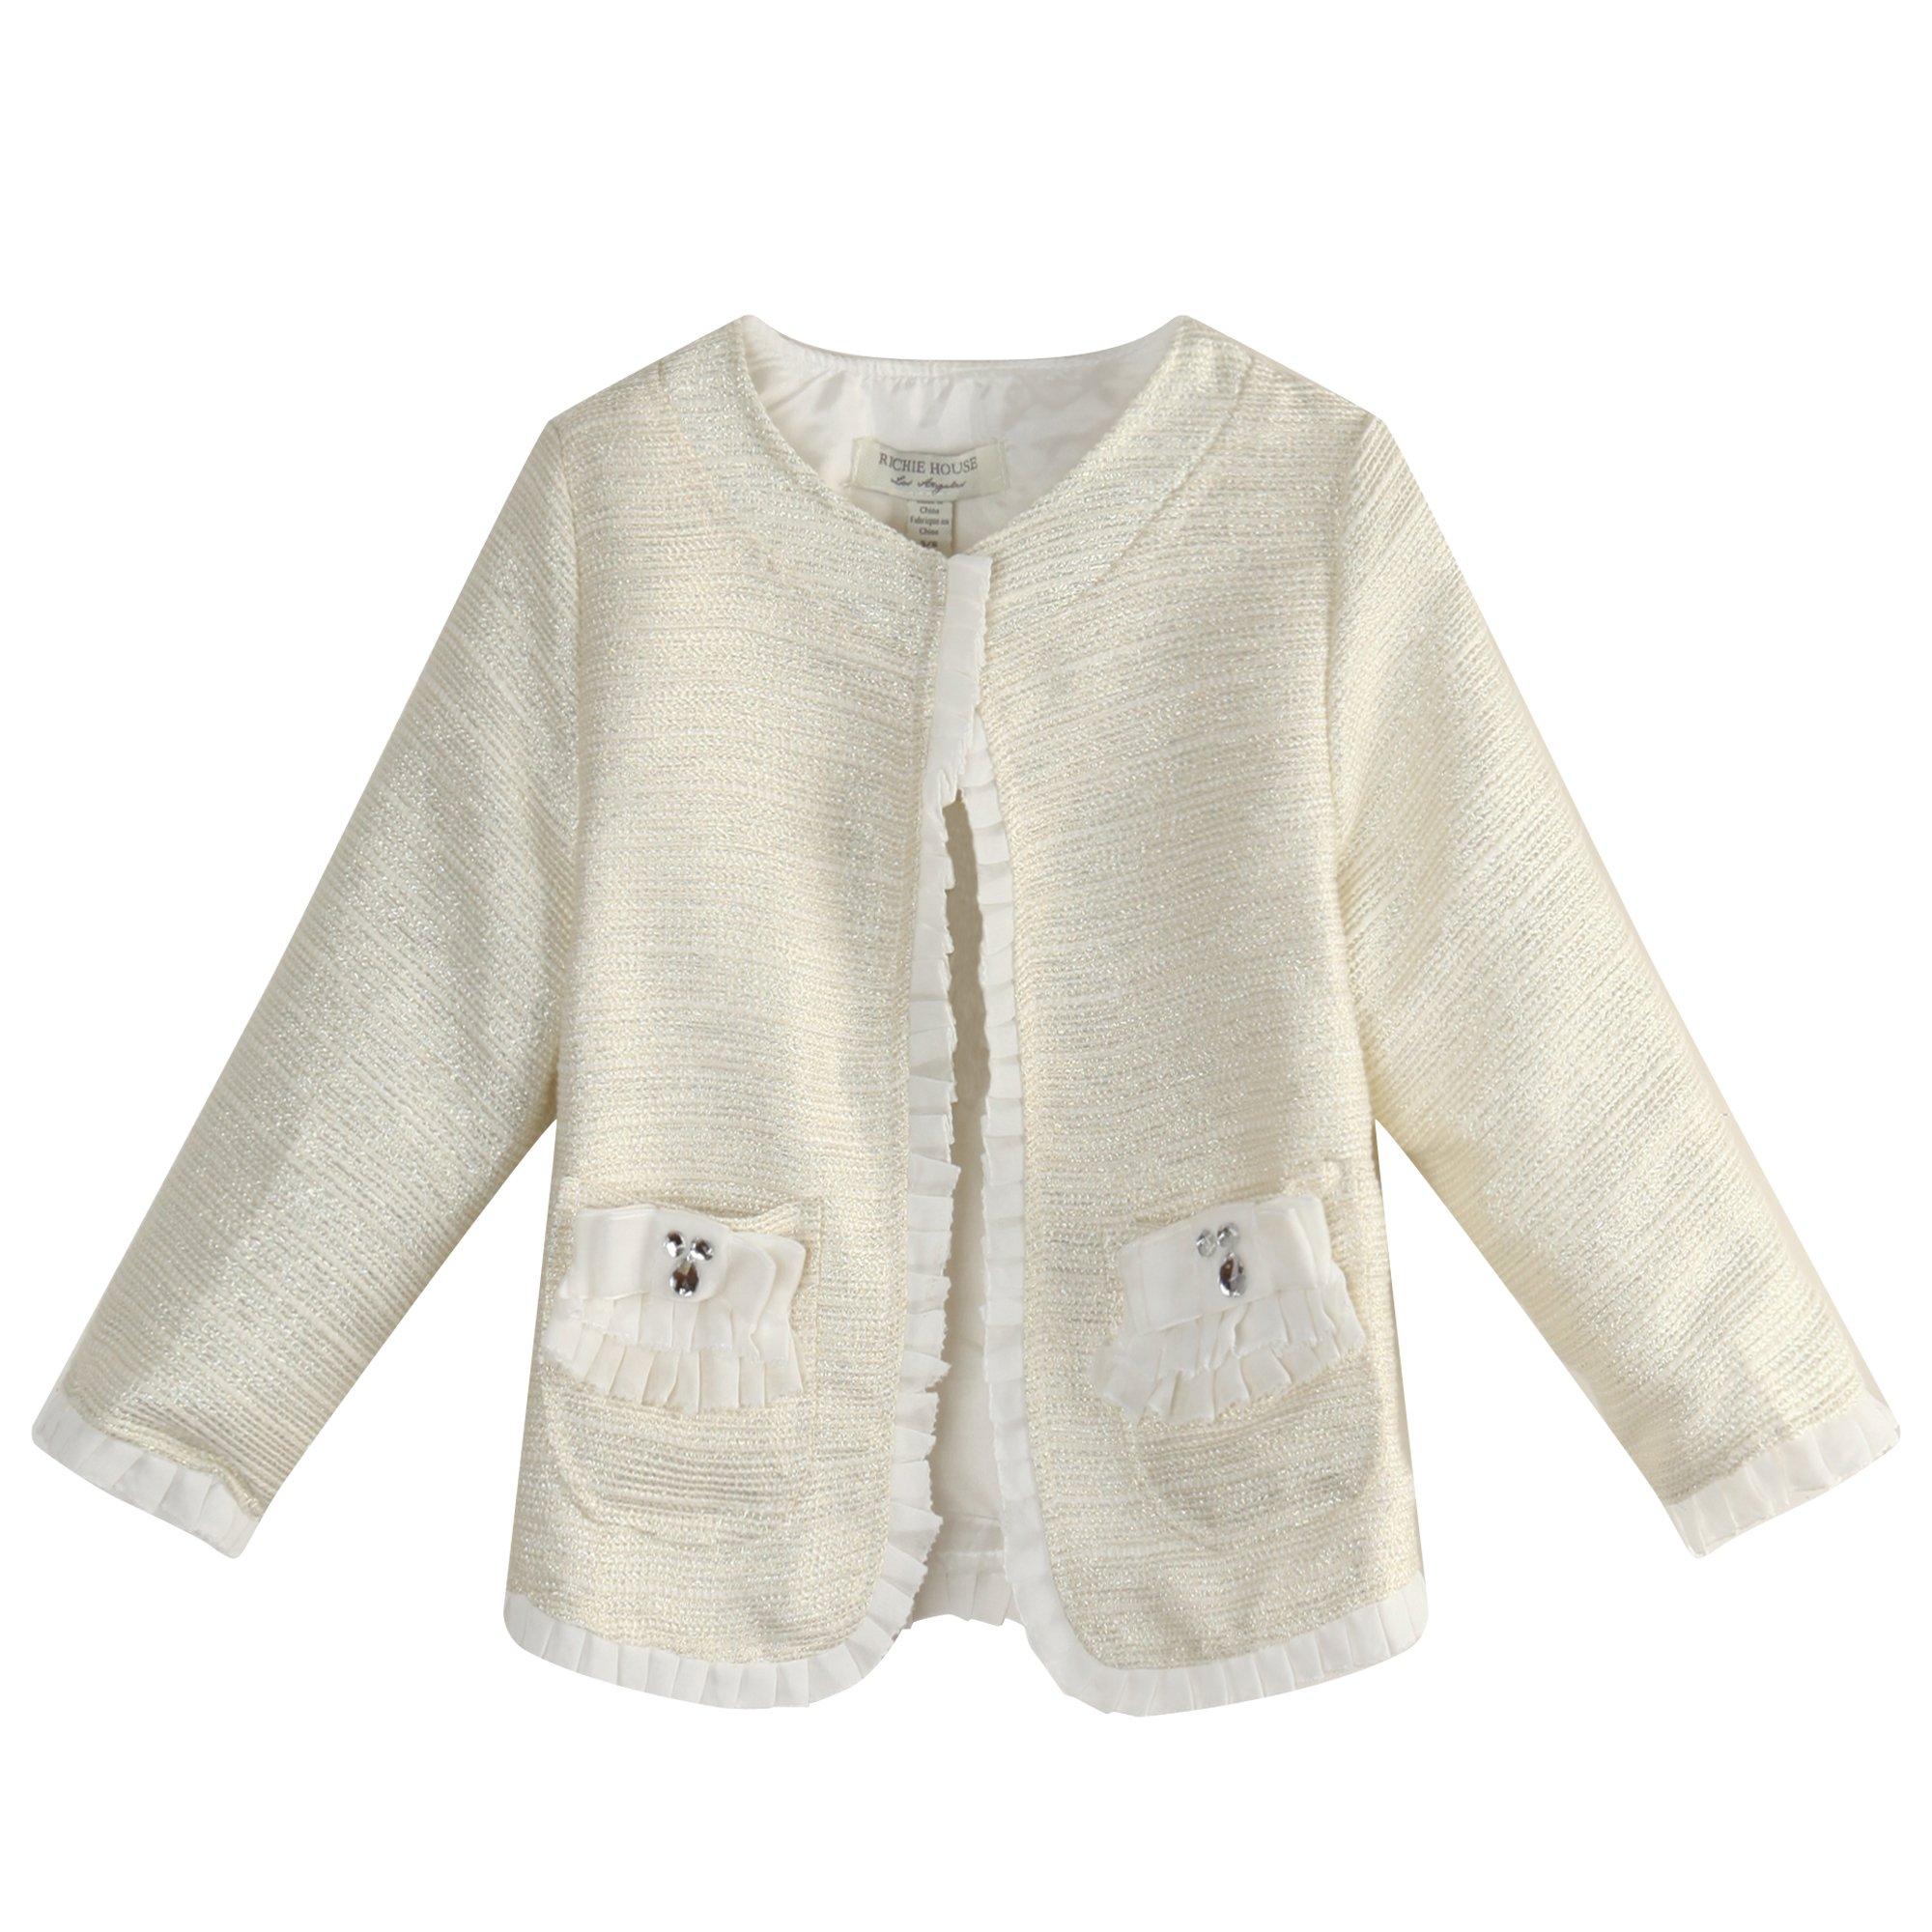 Richie House Little Girls' Coat With Flounced Edges Decoration RH1065-3/4